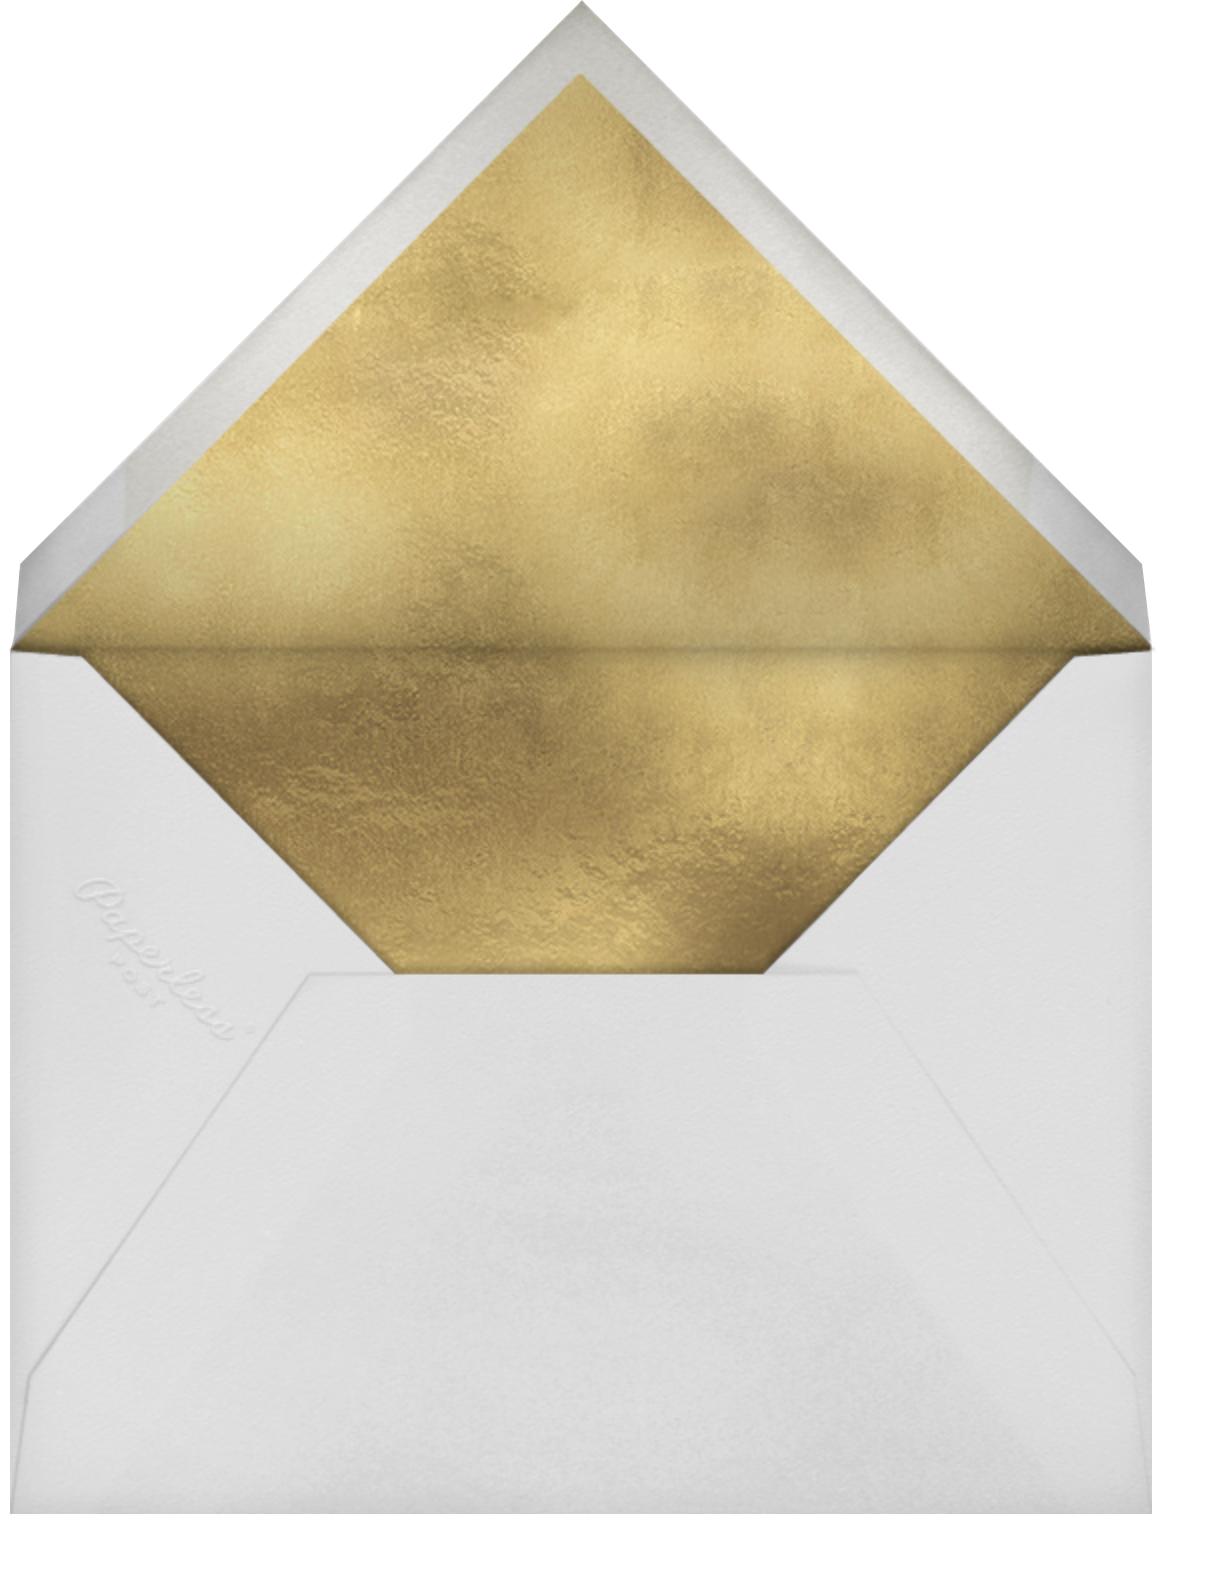 Perennial Valentine - Rifle Paper Co. - Envelope